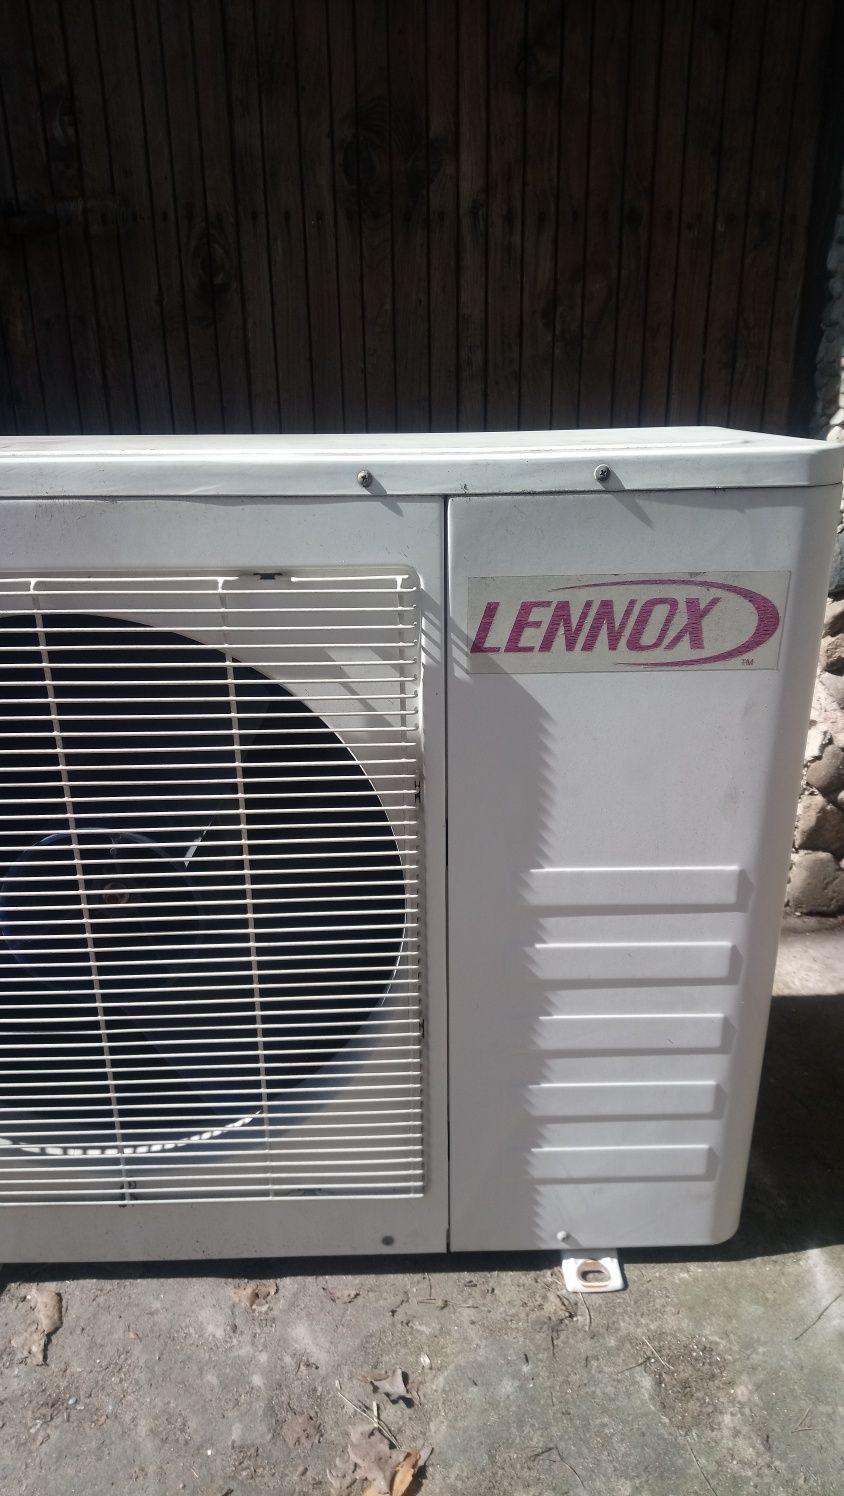 Lennox klimatyzator